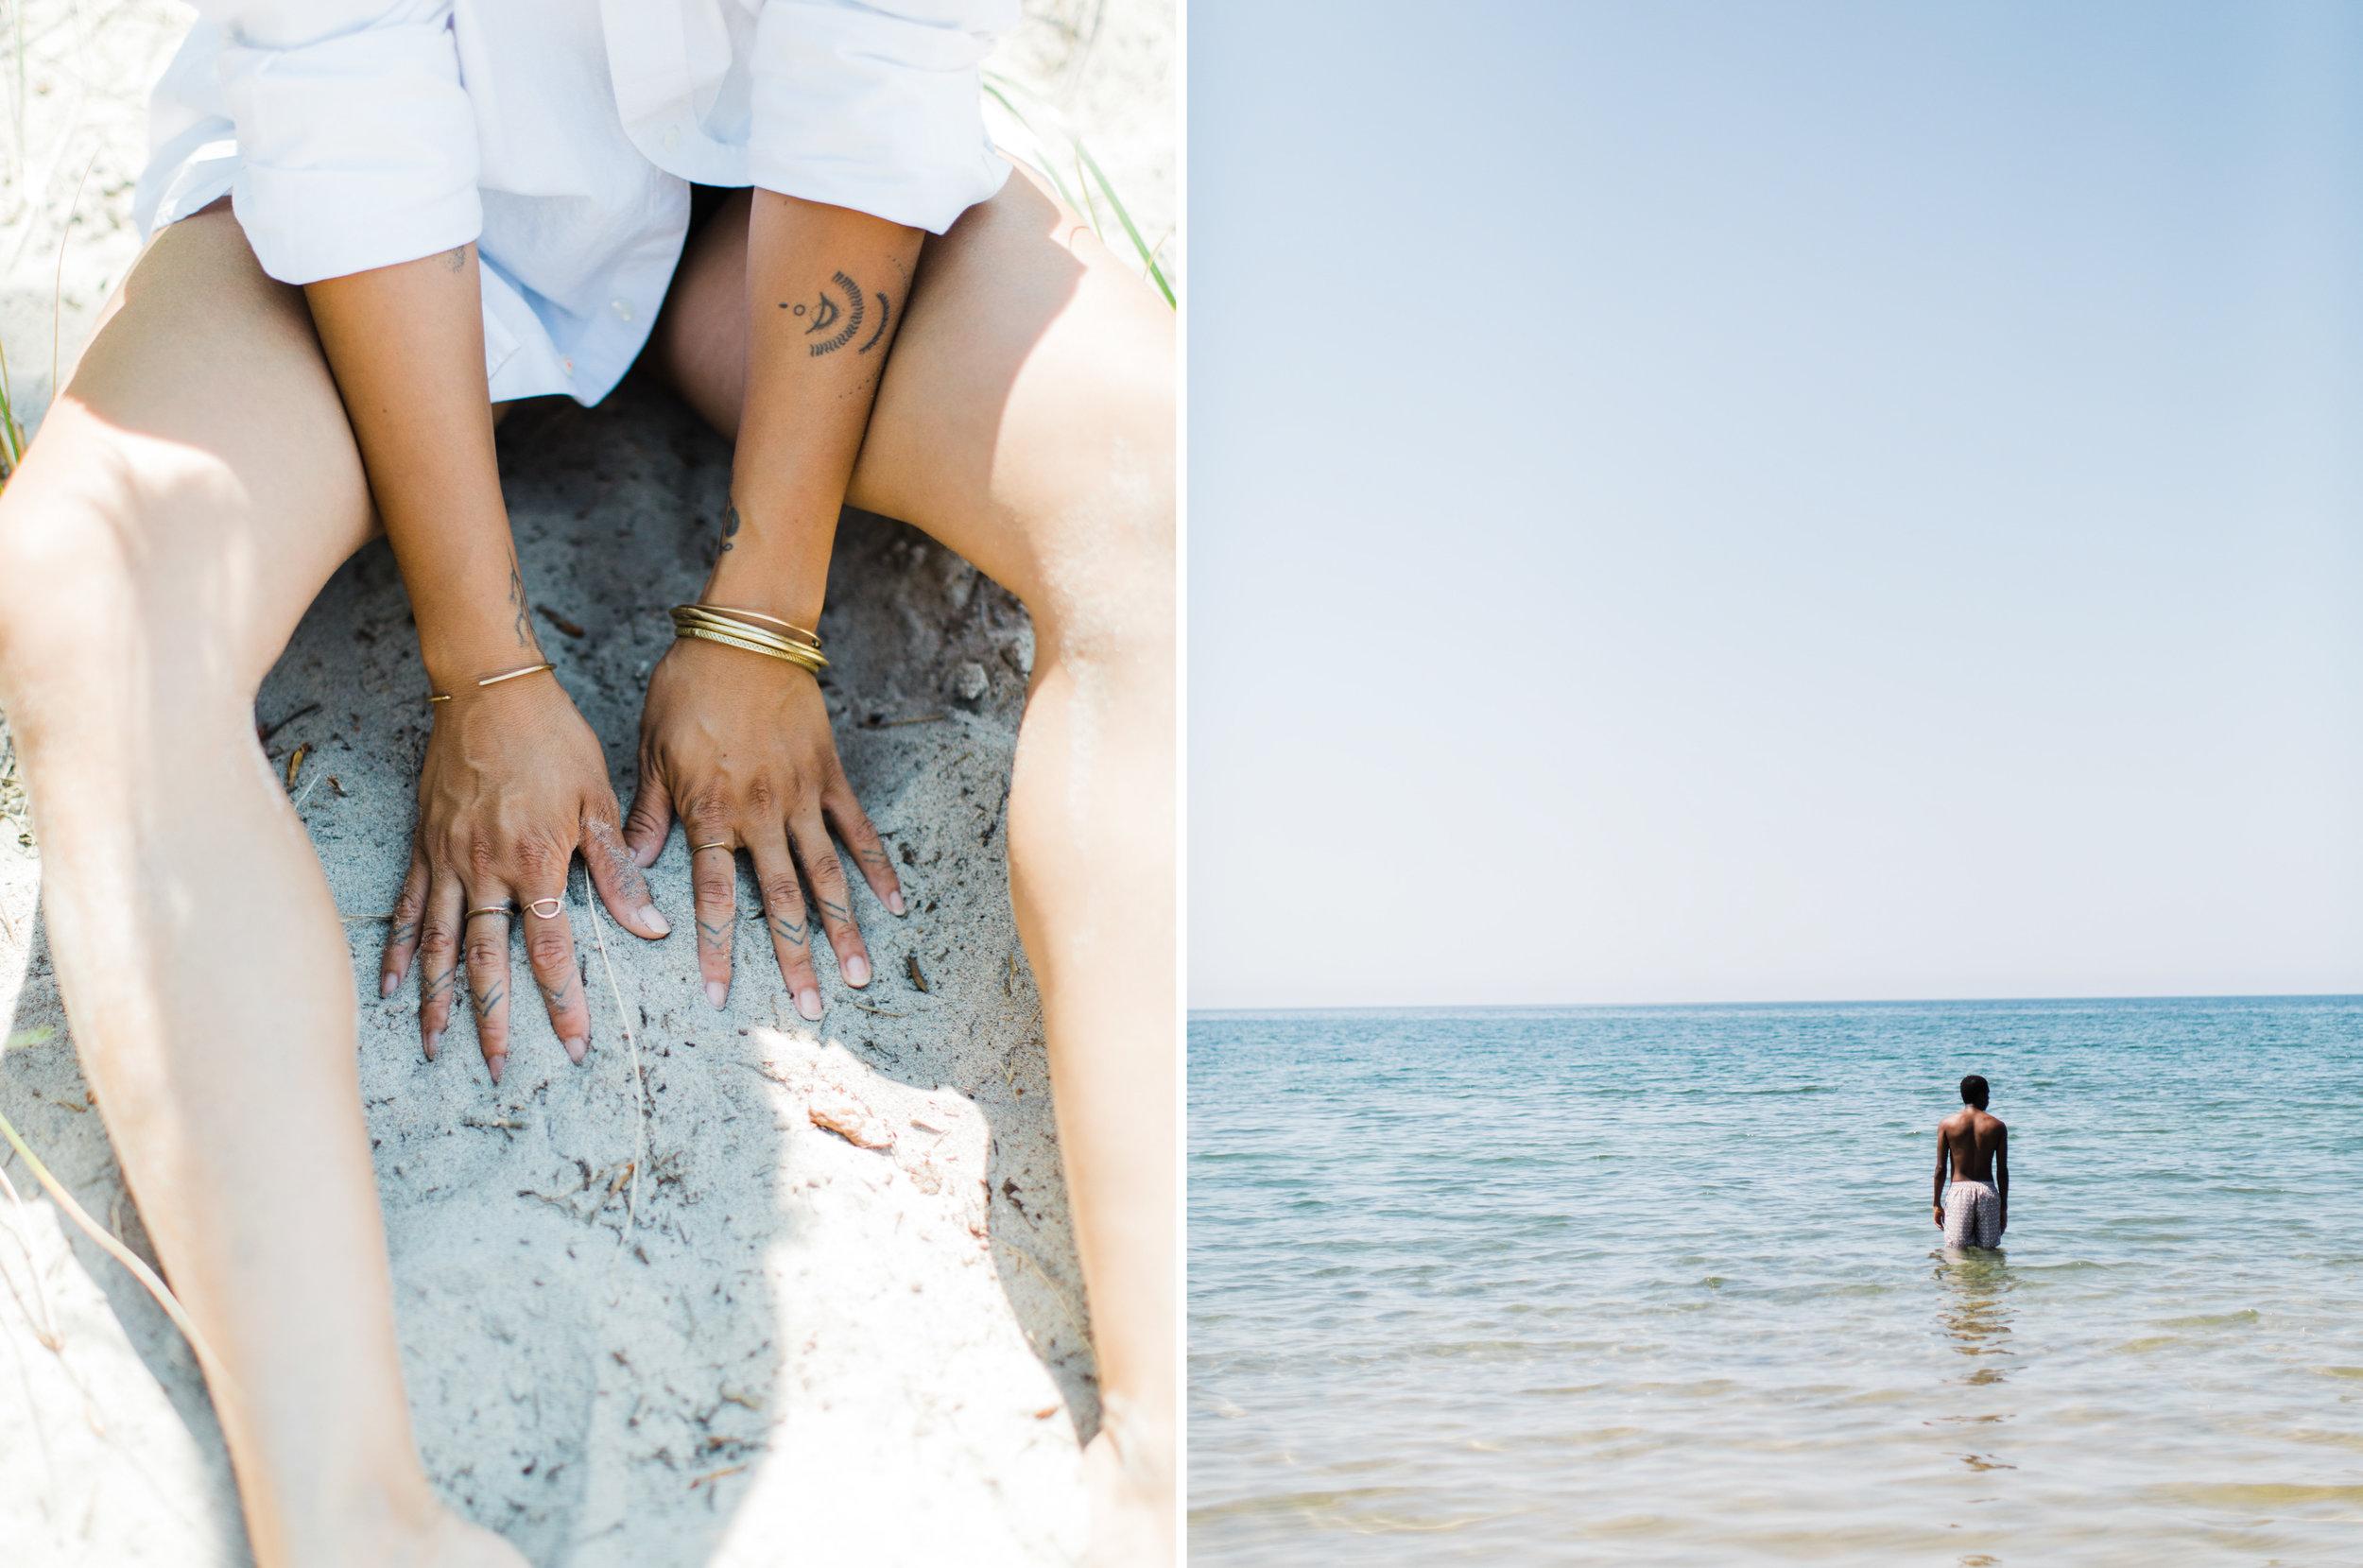 toronto_wedding_photographer_beach_fine_art3.jpg